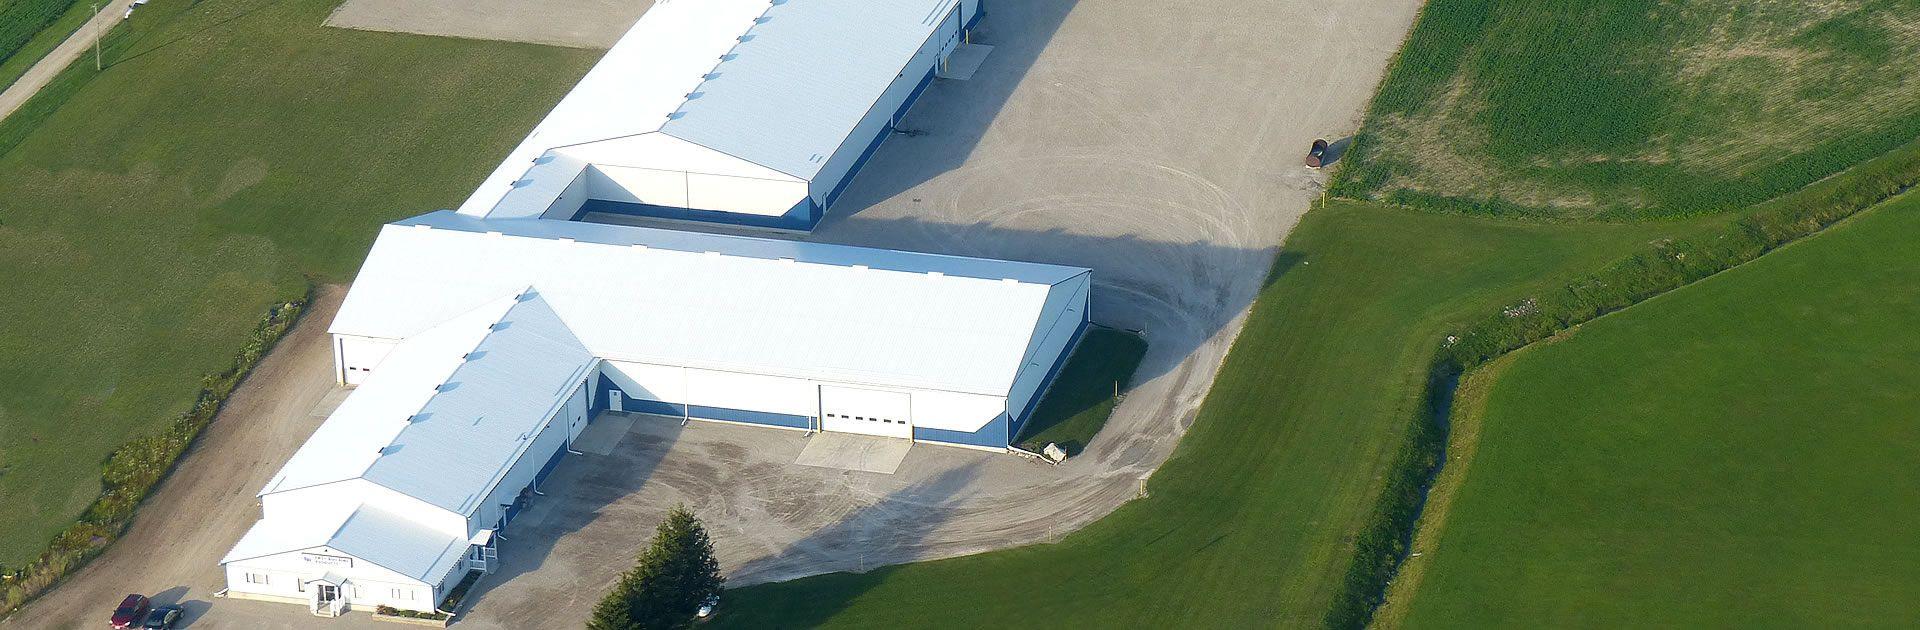 EBP Building aerial view